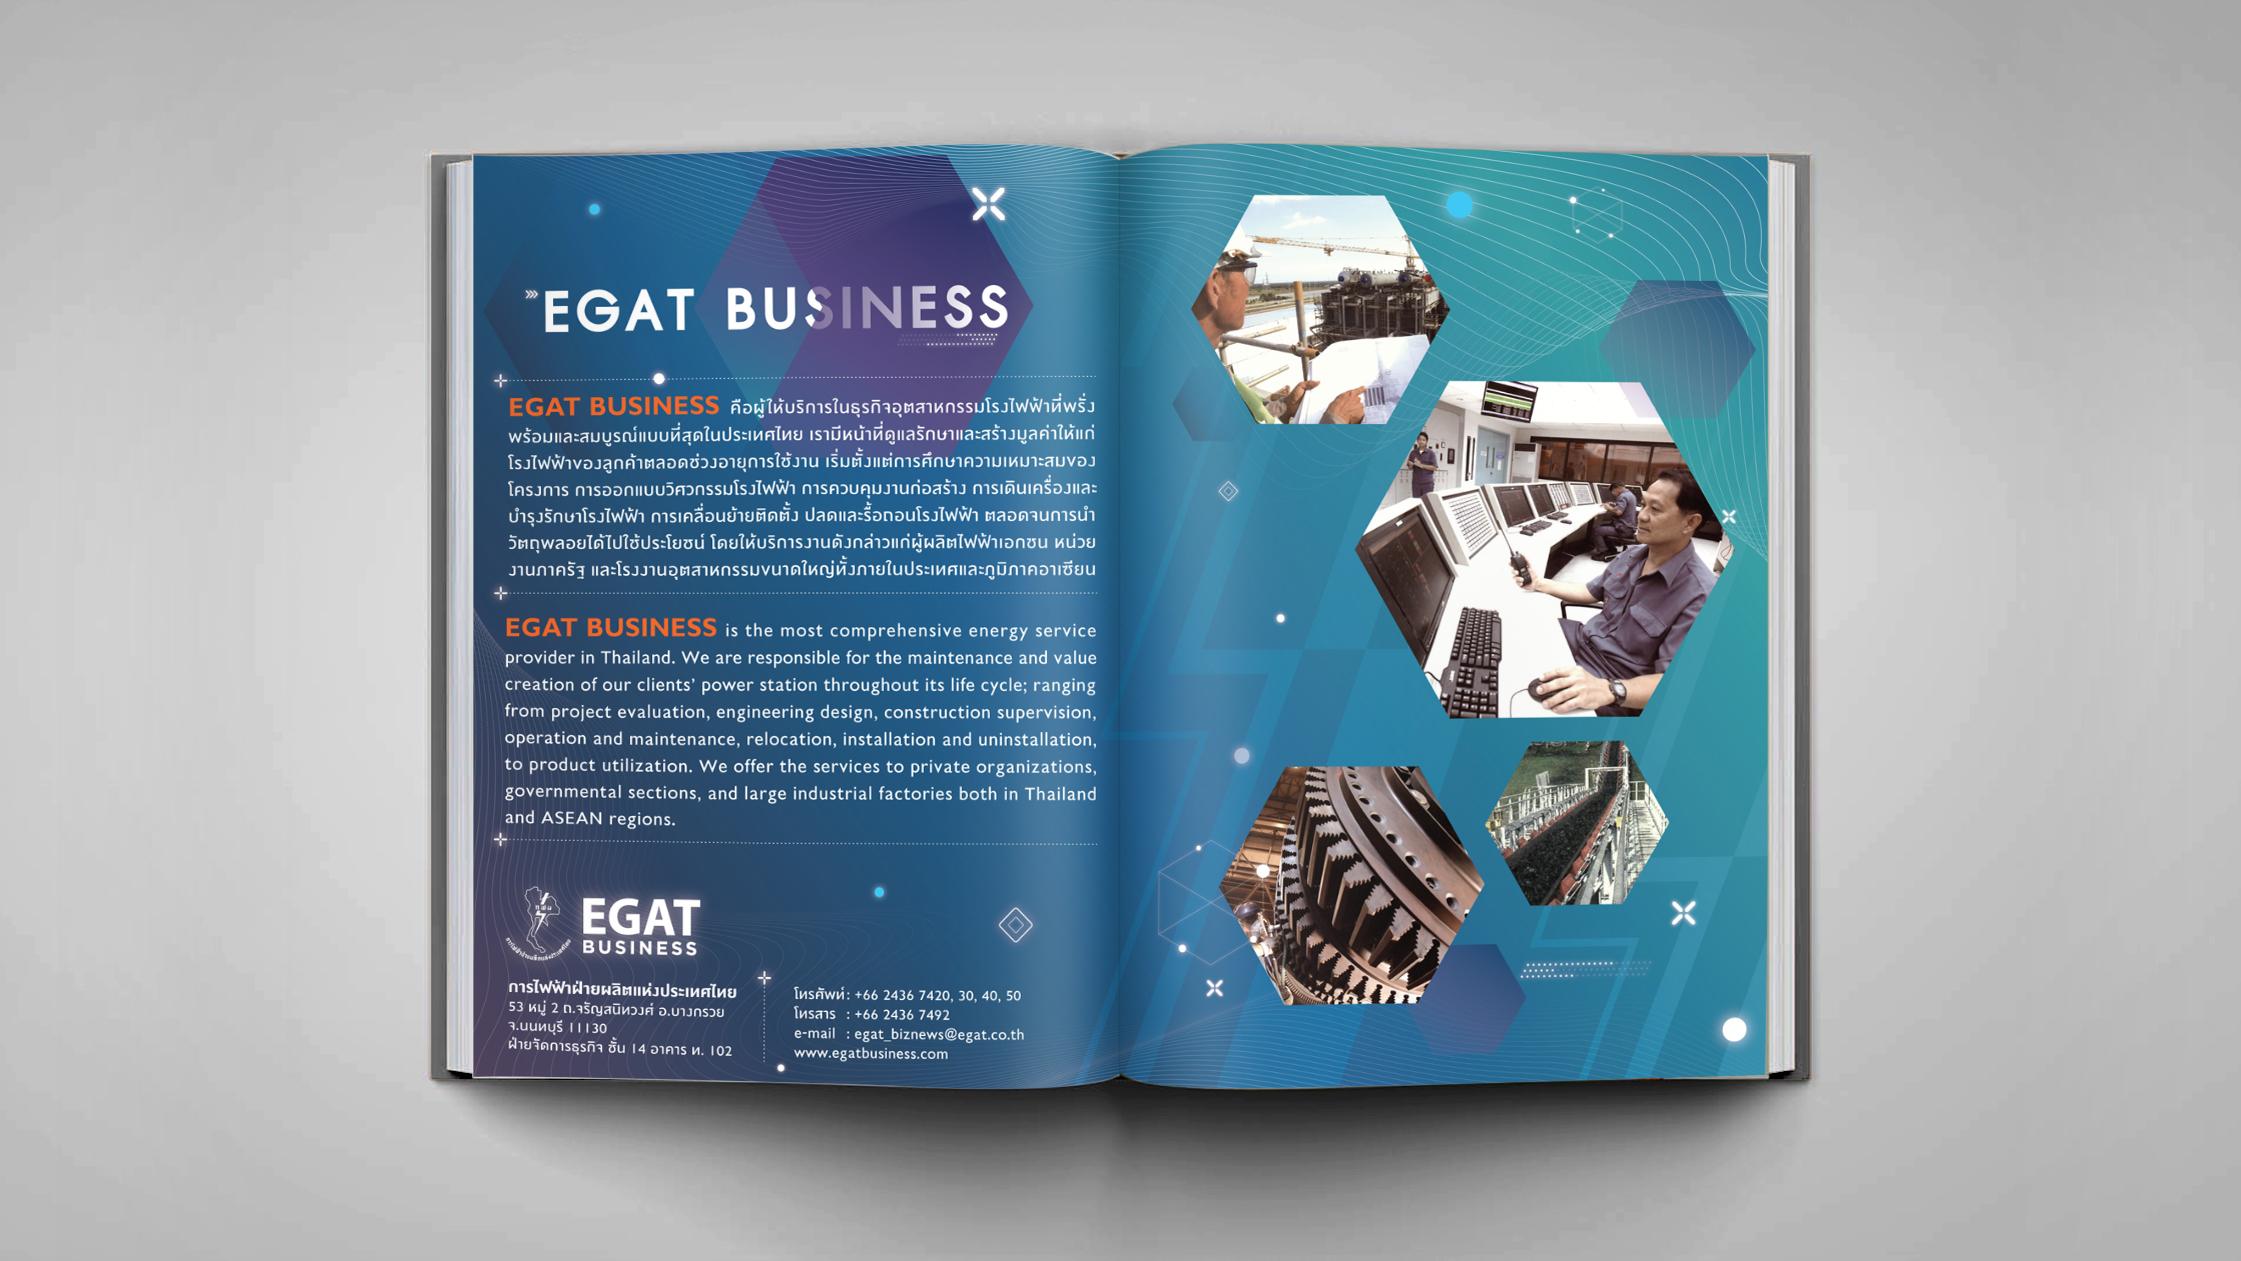 EGAT Bussiness